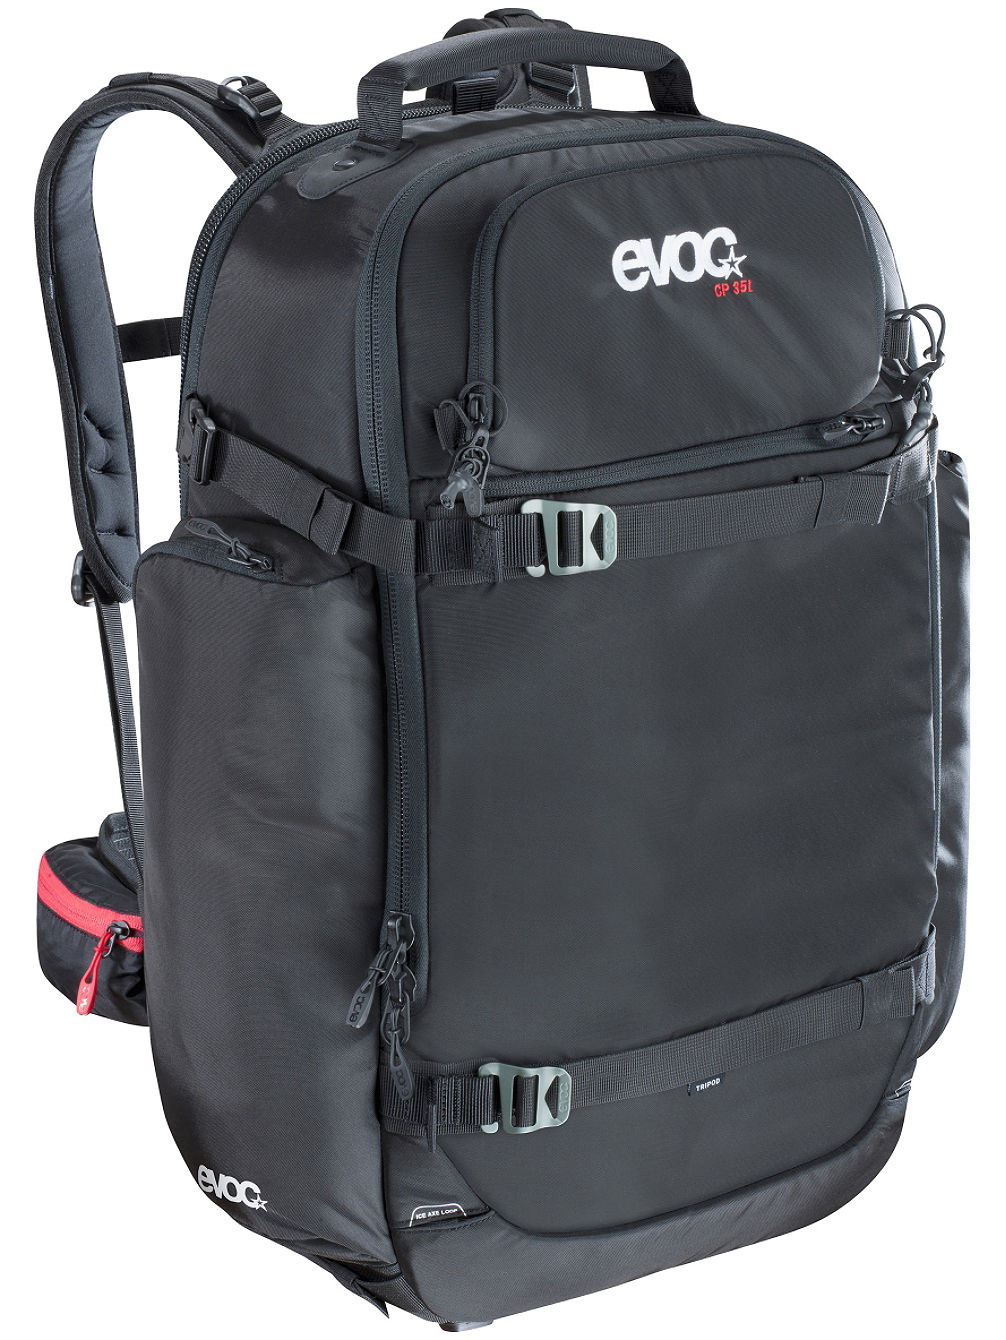 Evoc Camera 35L Backpack Nero- evoc - blue-tomato.com